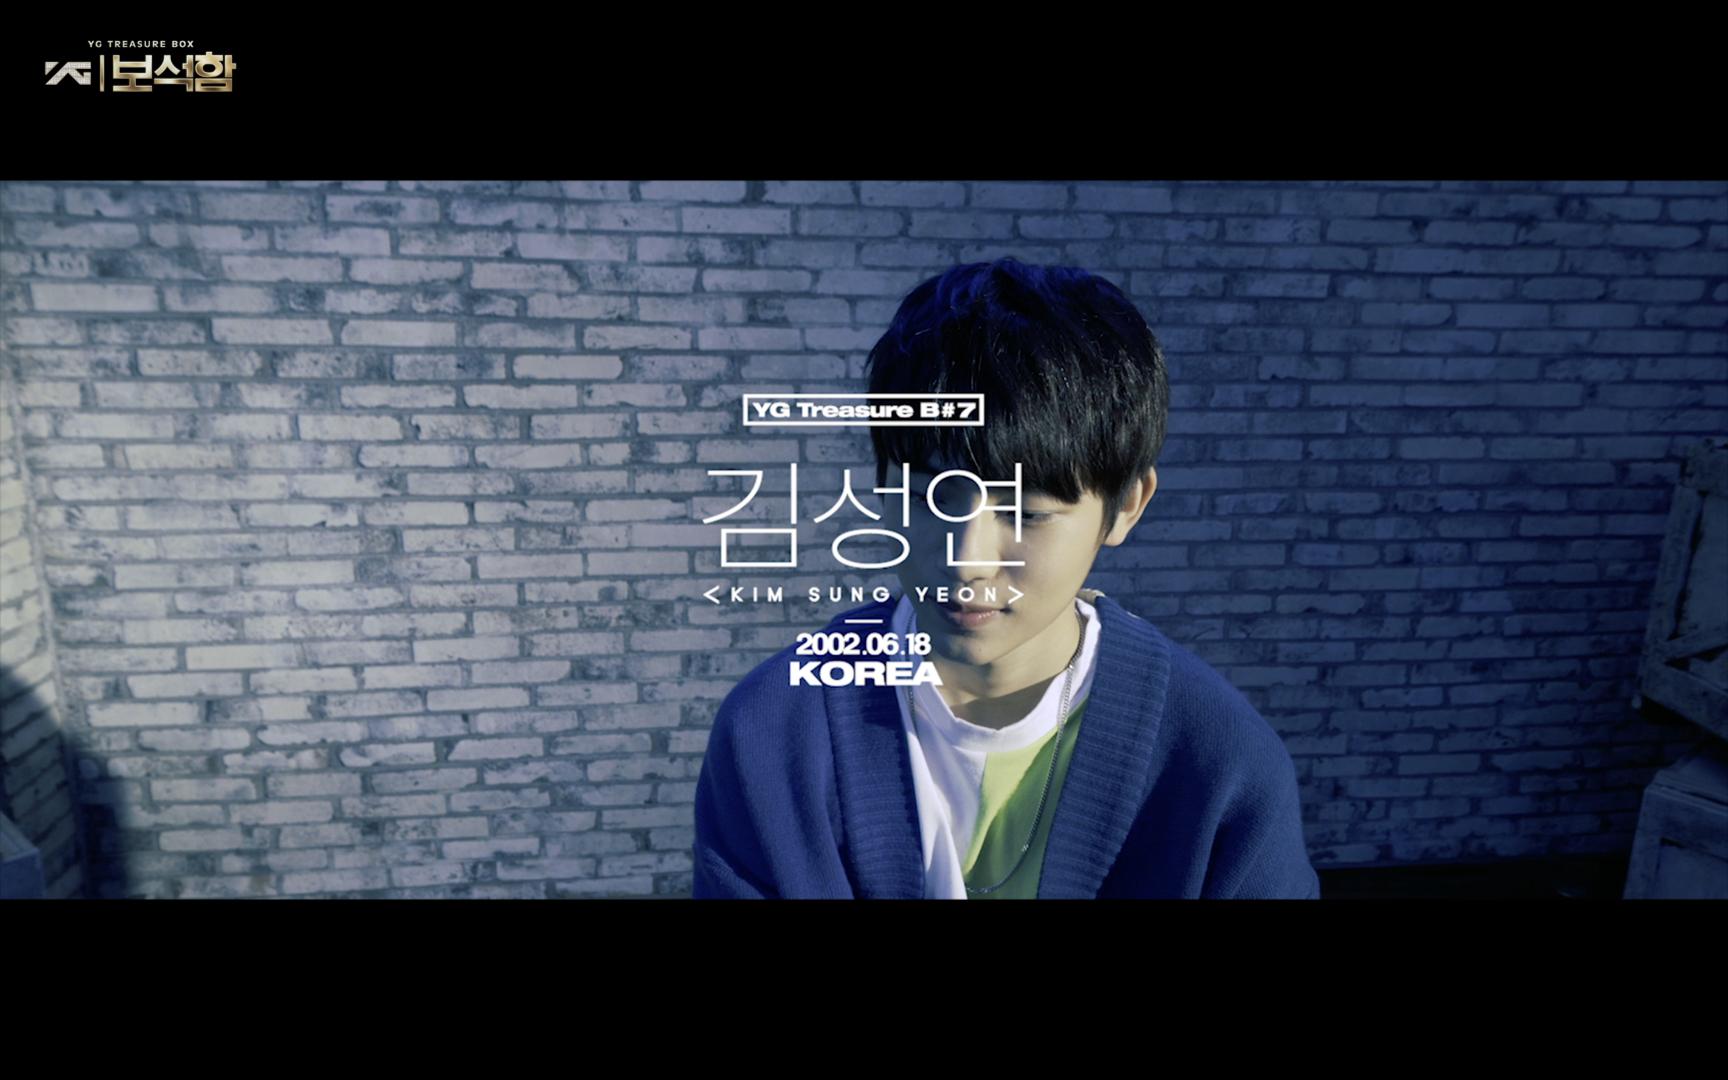 YG보석함ㅣB#7 김성연 <KIM SUNGYEON> #인터뷰+퍼포먼스